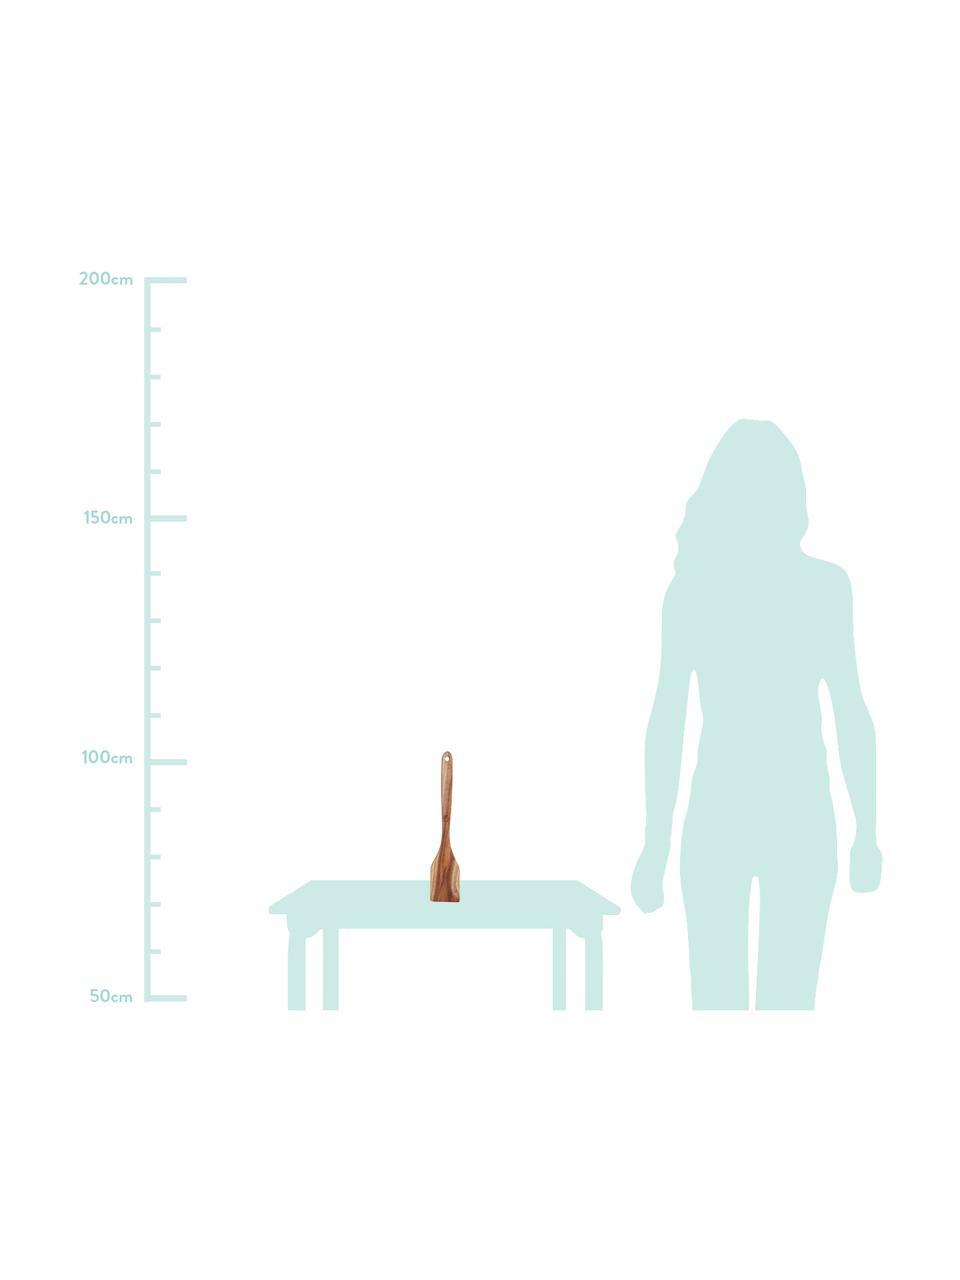 Pfannenwender Whis, Akazienholz, Akazienholz, 8 x 31 cm